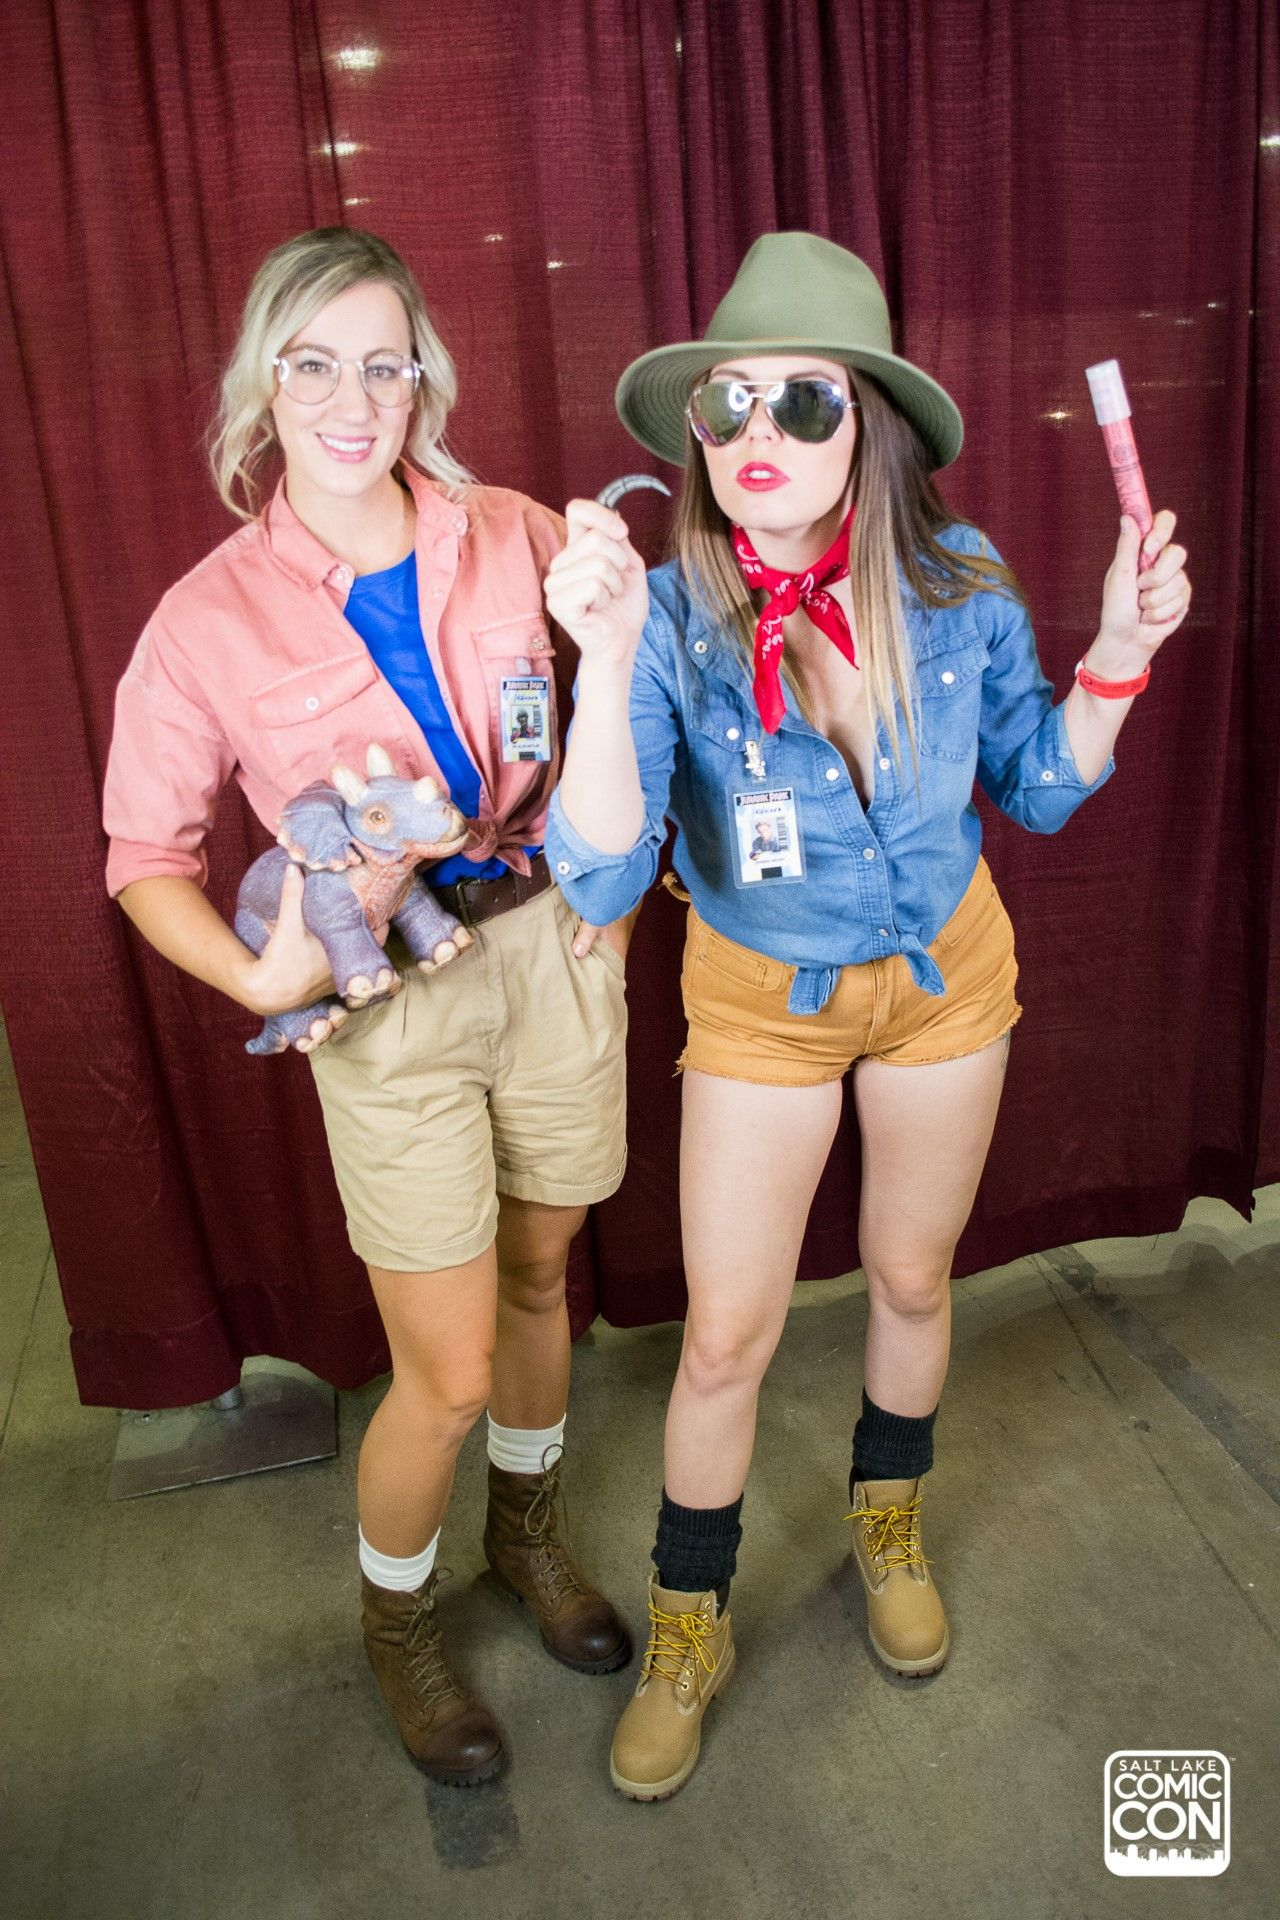 jurassic park costumes / cosplay at salt lake comic con 2016 more